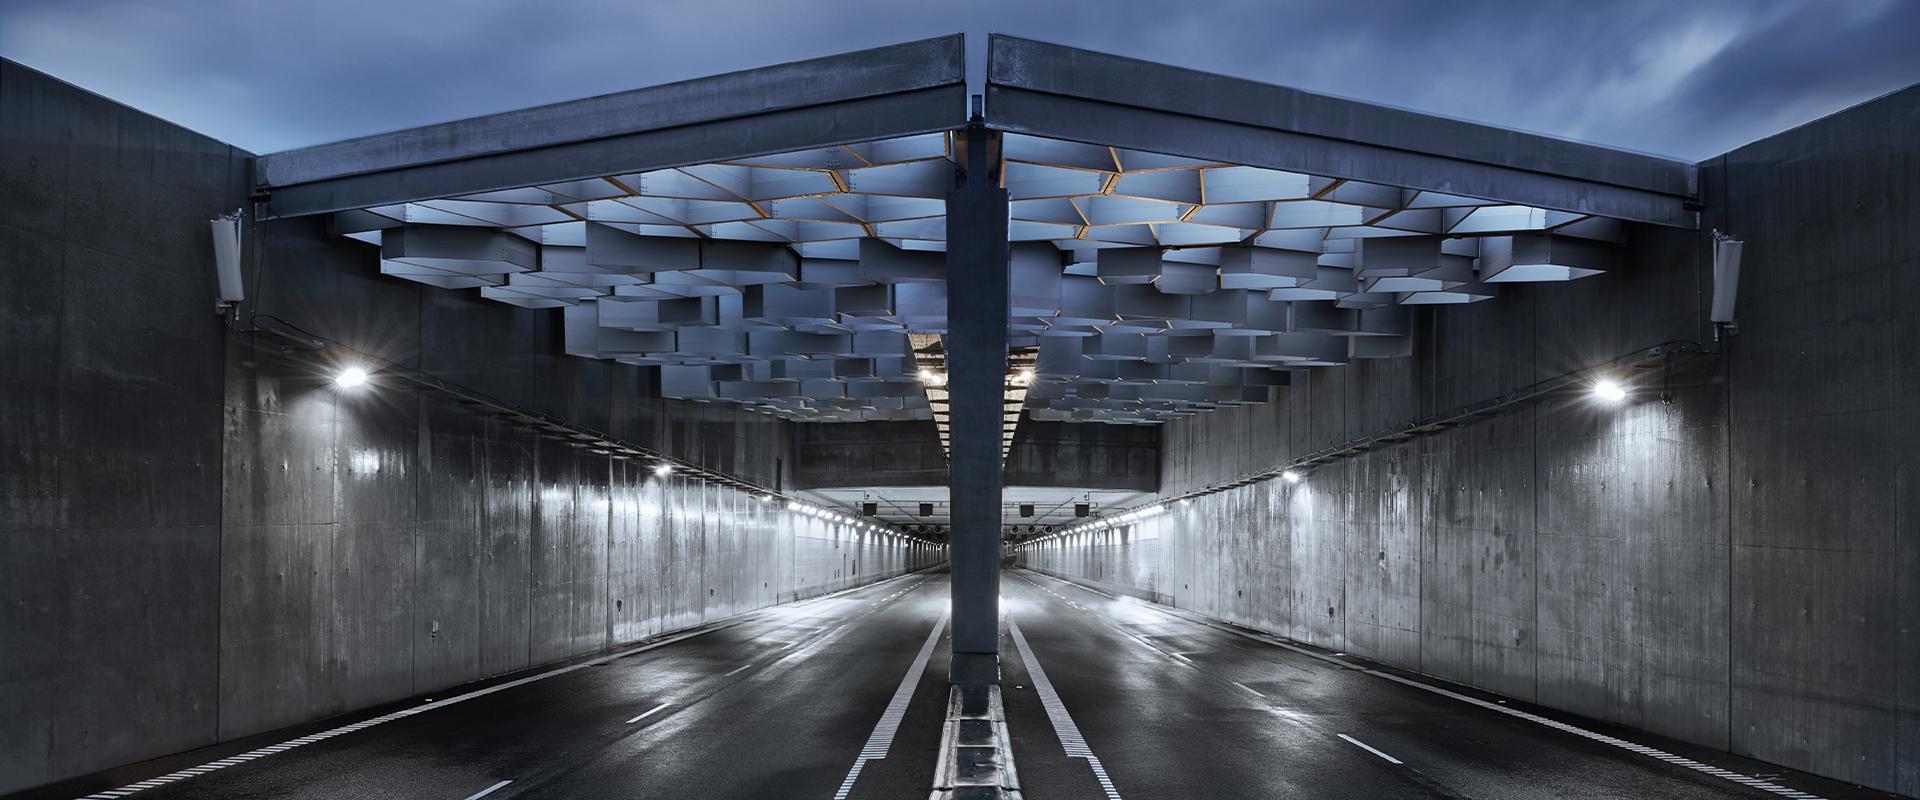 Faro a LED per illuminazione LED di gallerie.